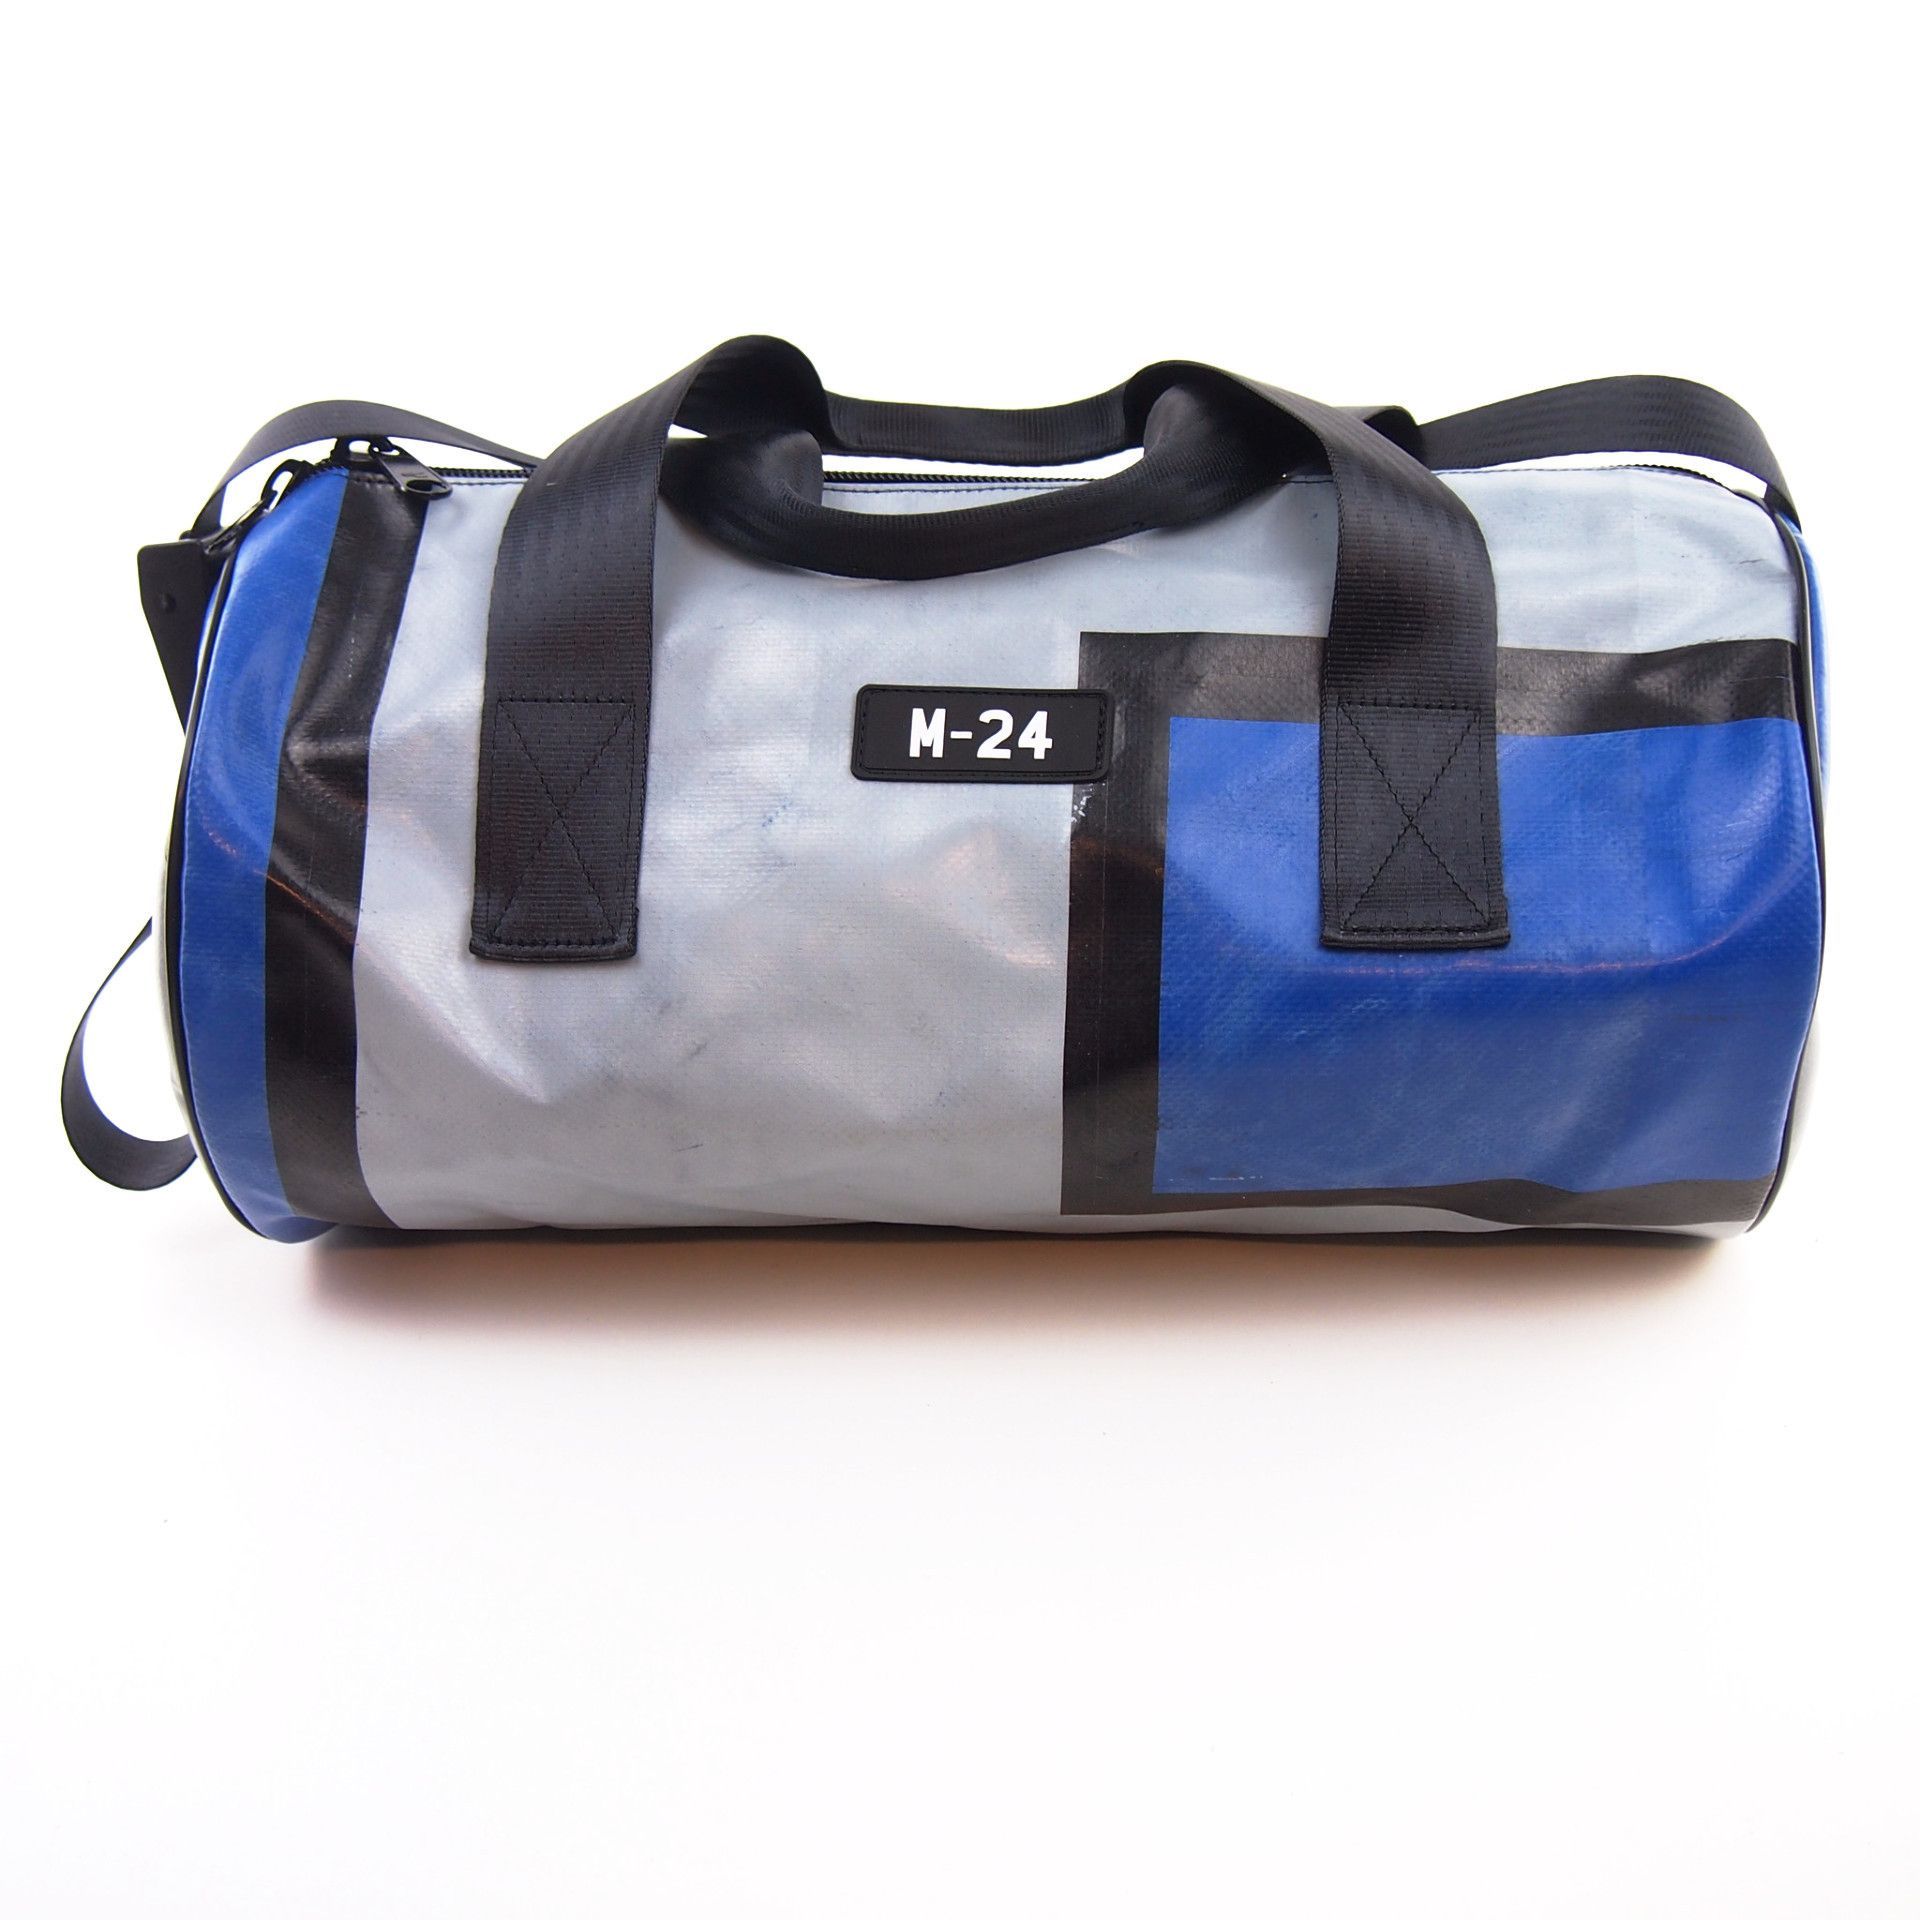 Keg Blue Grey And Black Gym Duffle Bag M 24 Upcycled